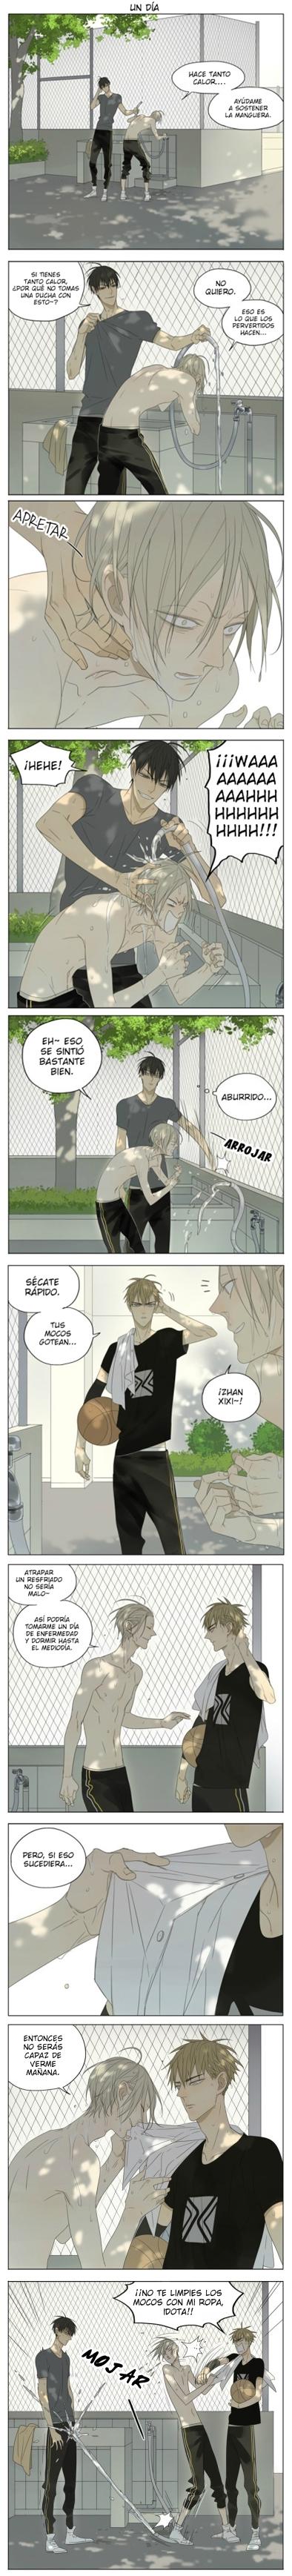 http://c5.ninemanga.com/es_manga/7/15943/414747/8718a4101d50a4abcc1af658c5f899be.jpg Page 2